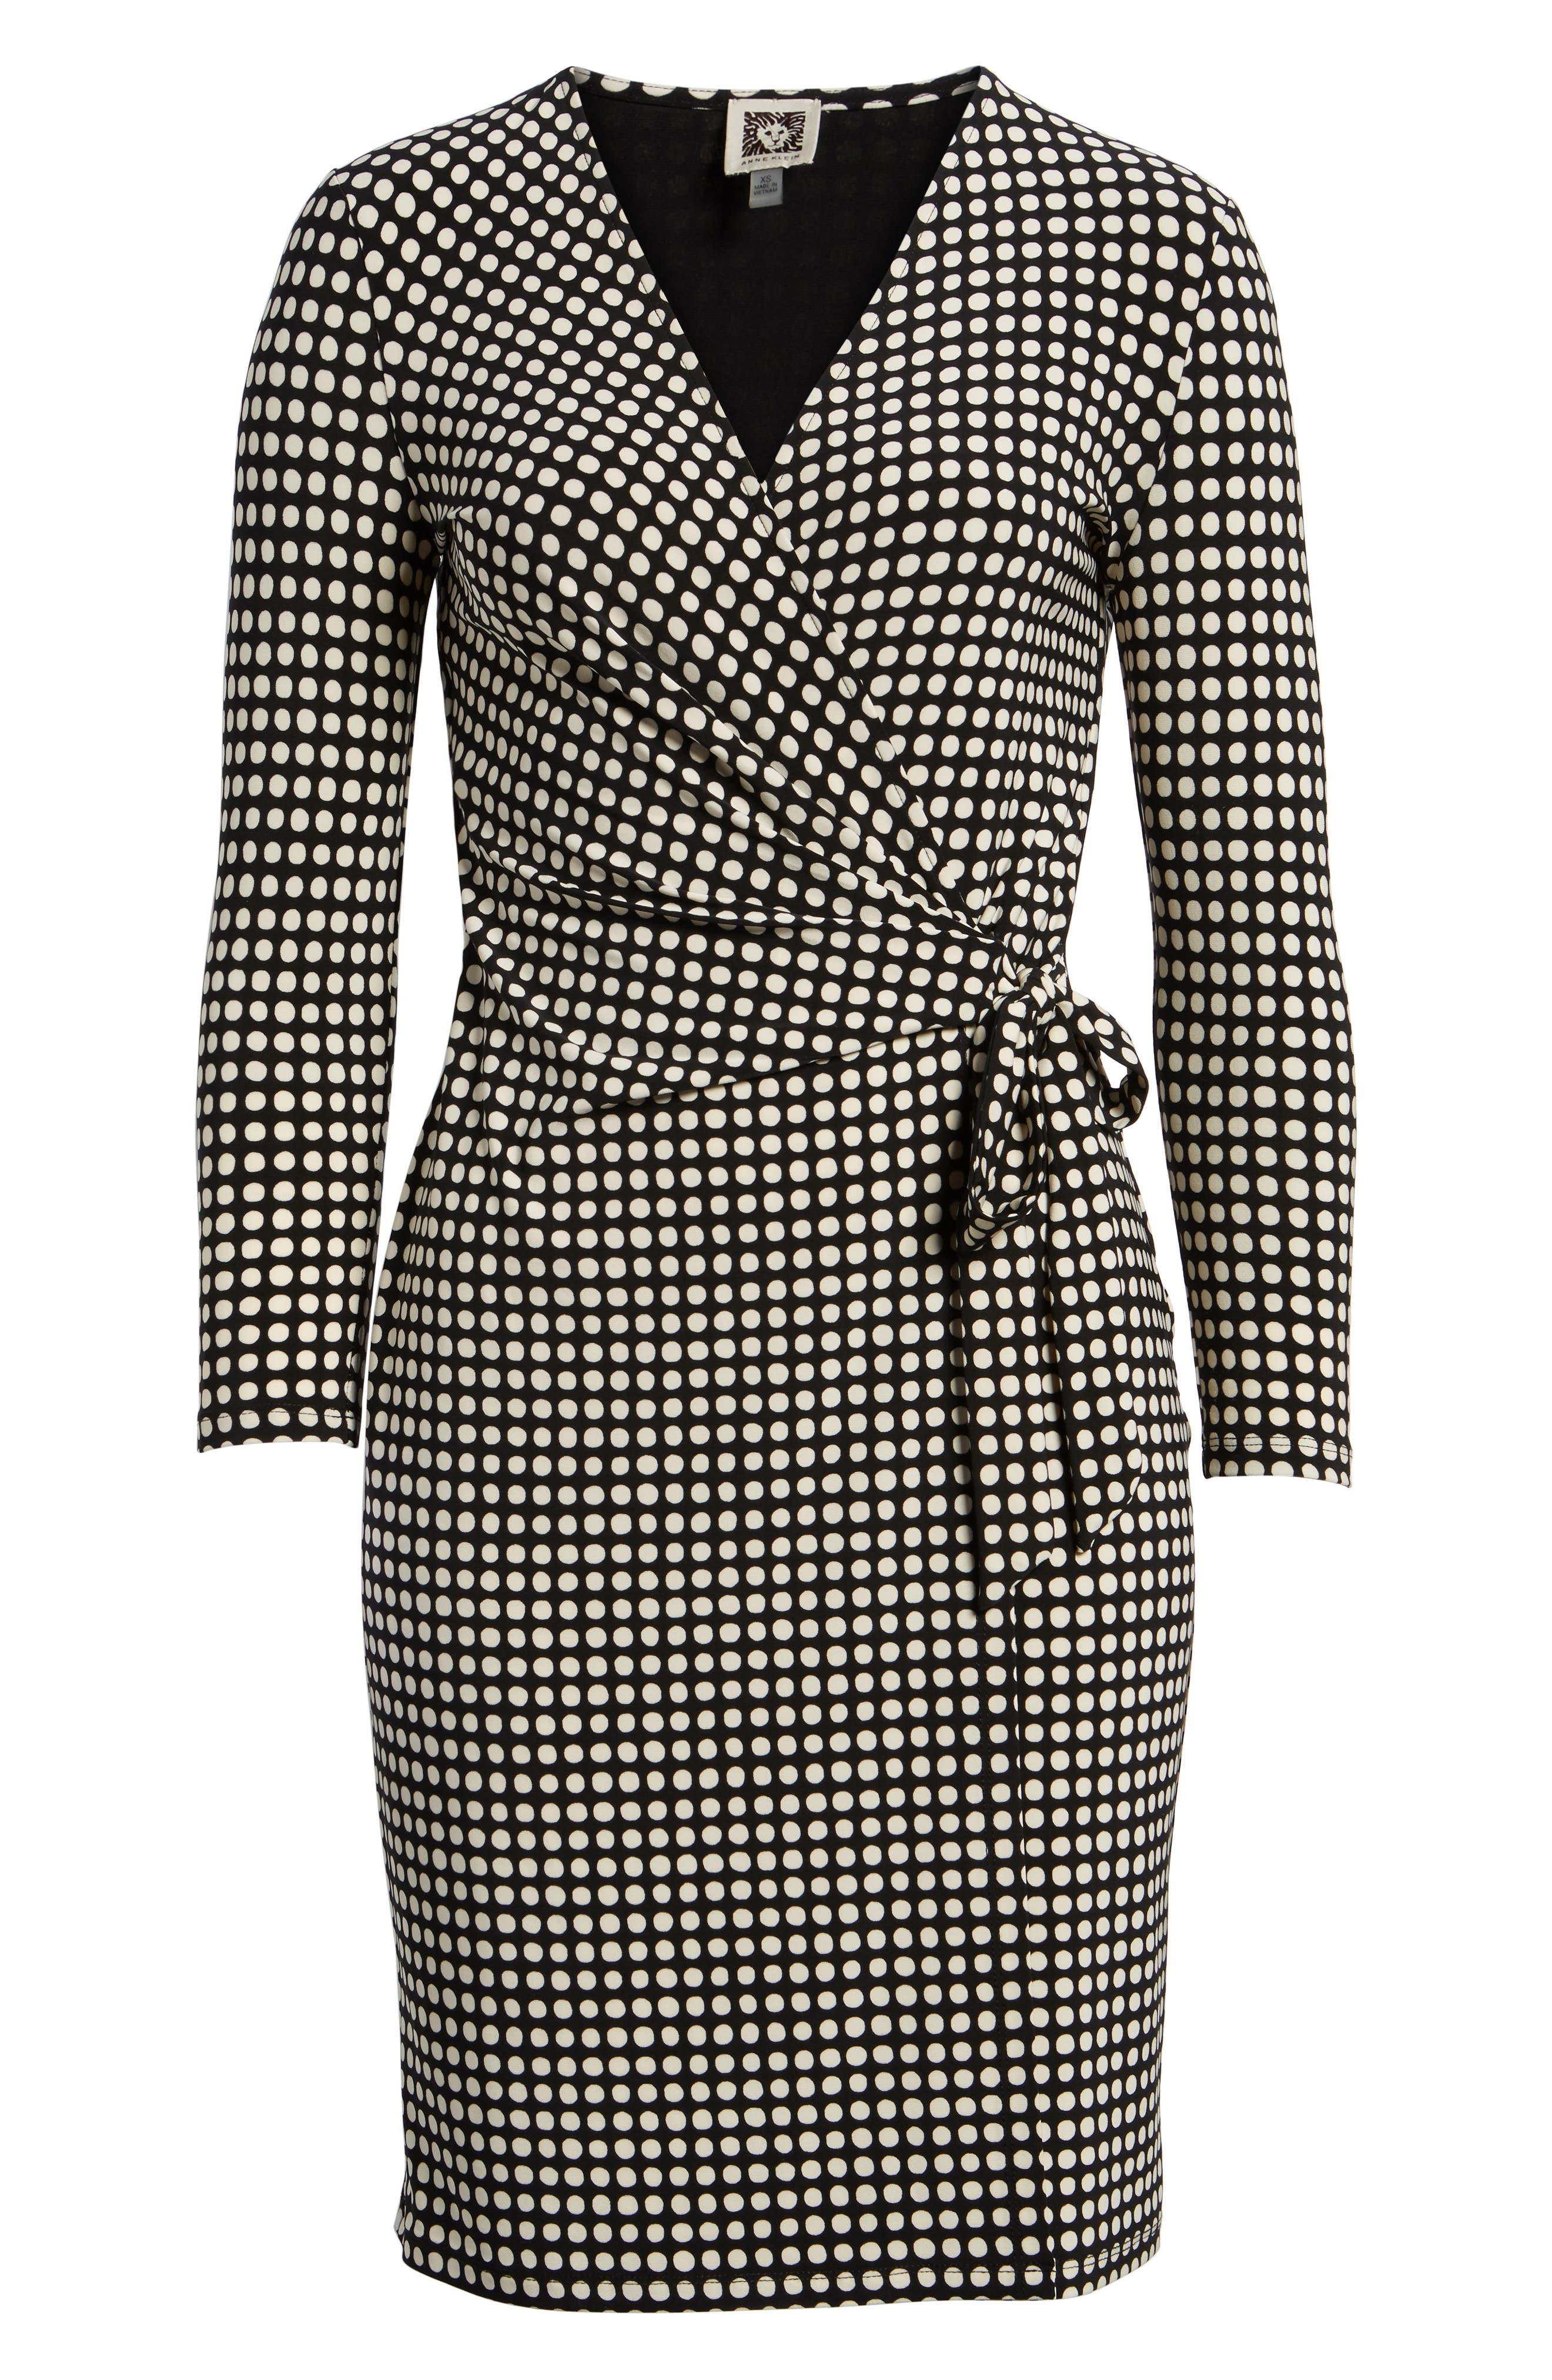 New York Pearly Dot Classic Wrap Dress,                             Alternate thumbnail 6, color,                             Black/ Parchment